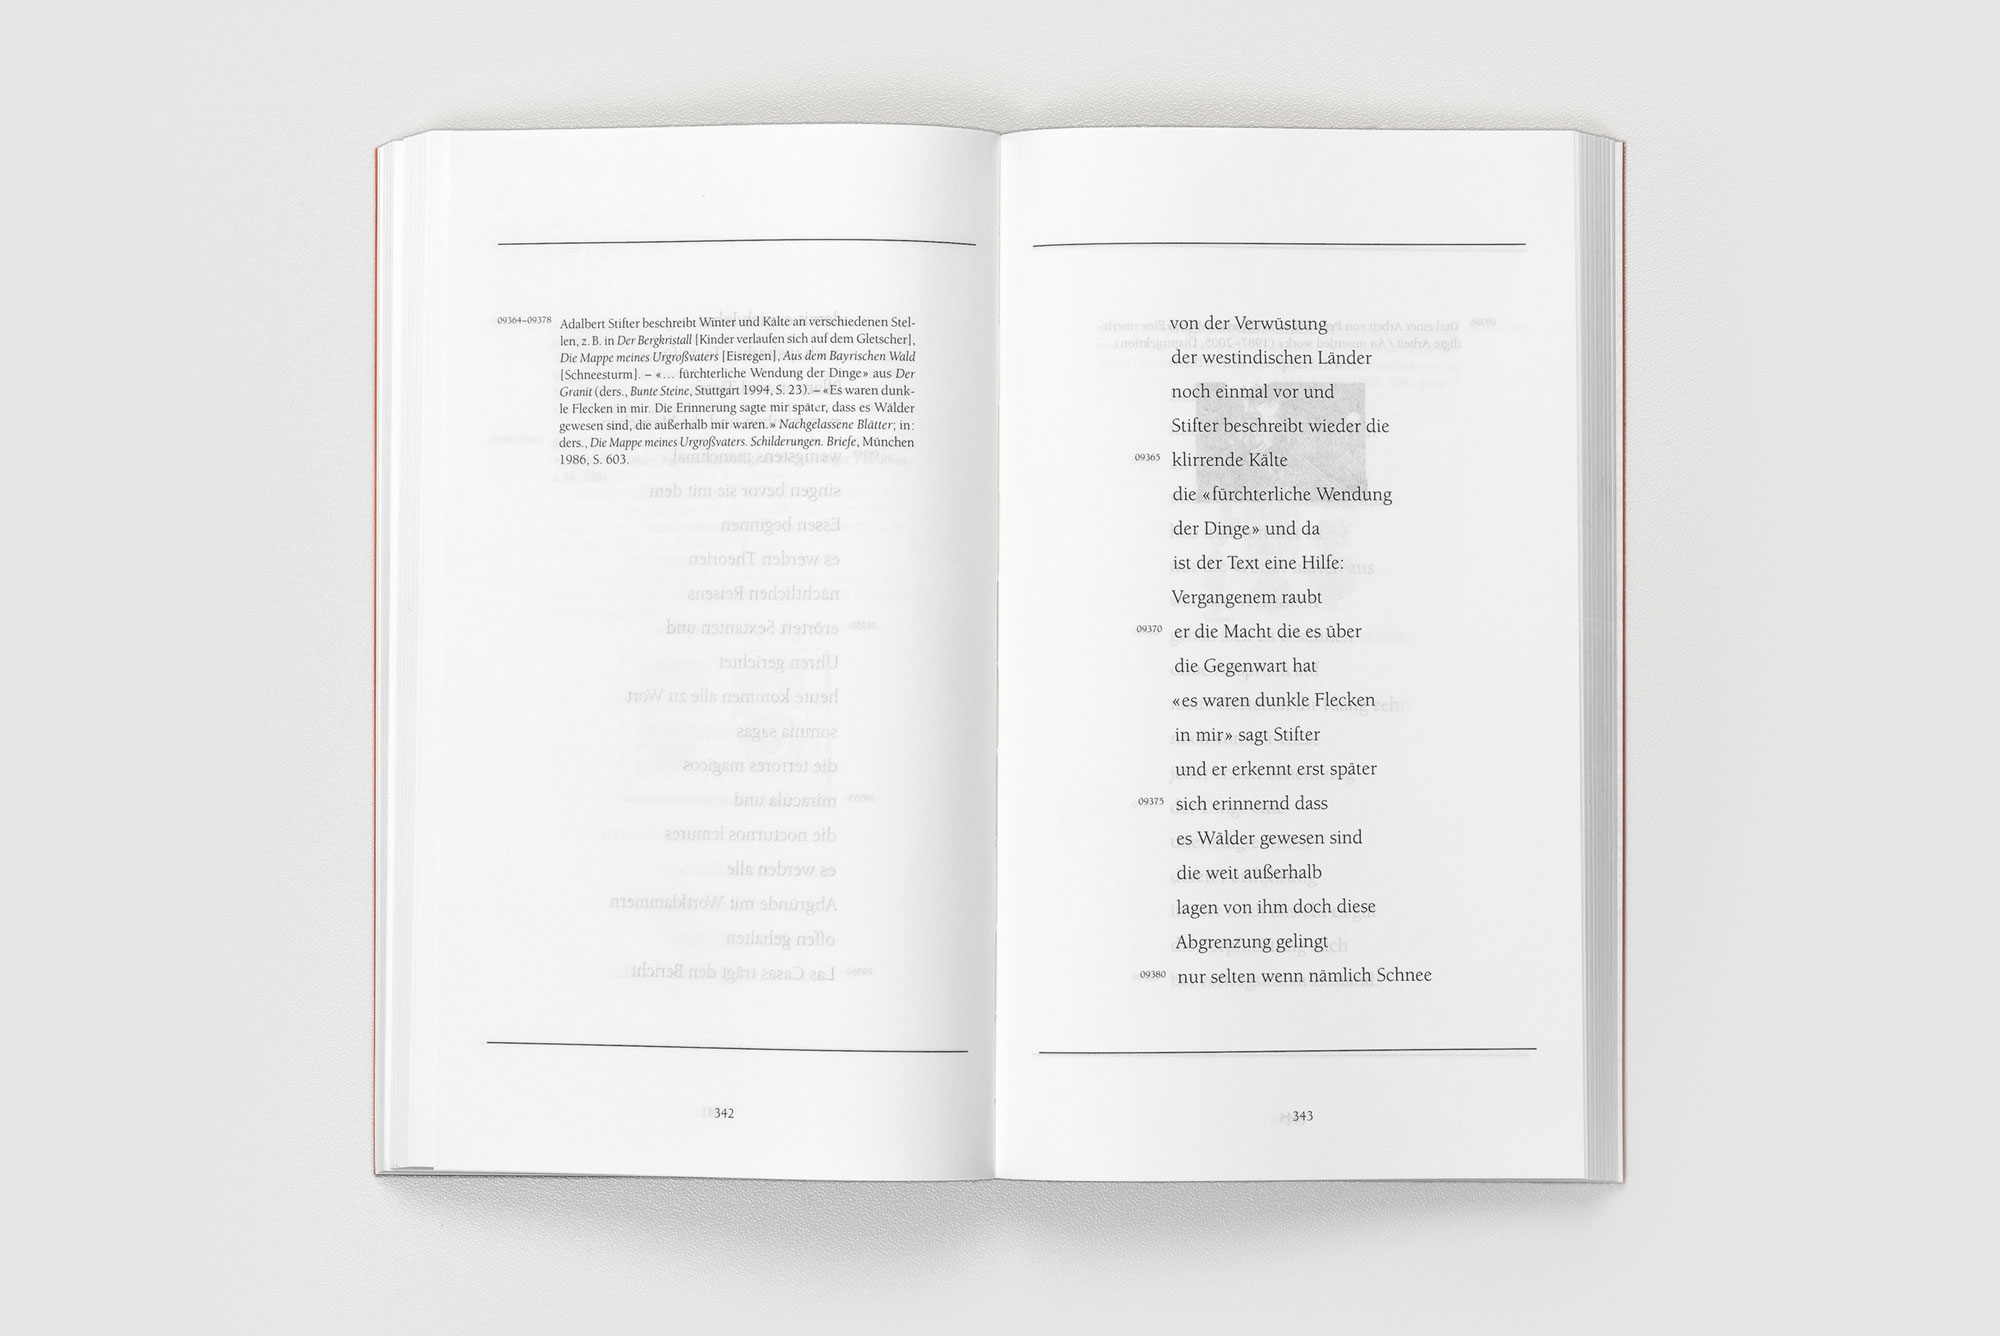 Frand Dodel – Nicht bei Trost, haiku s342 ©Atelier Pol